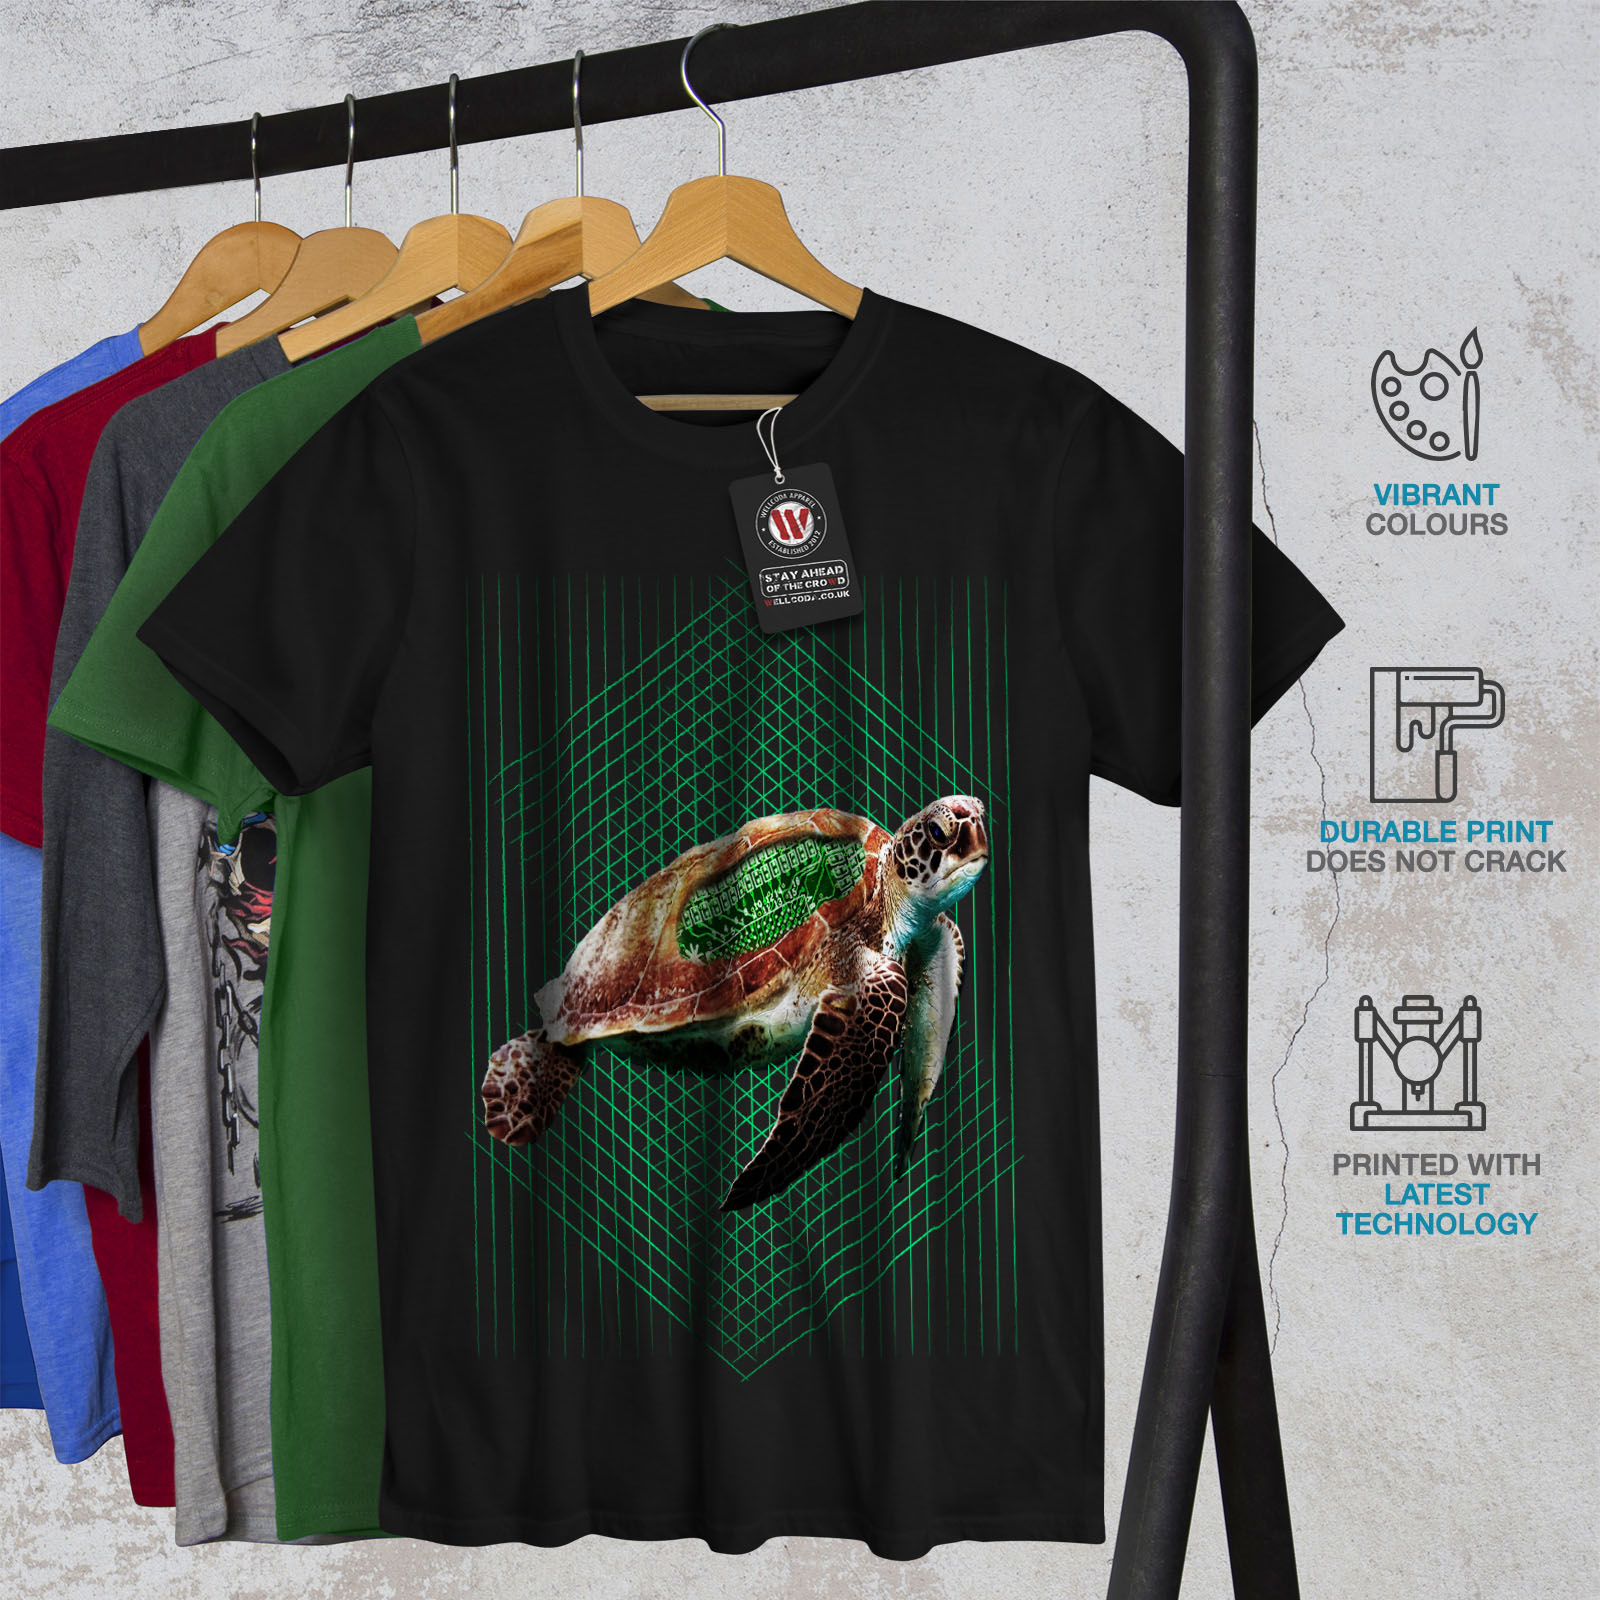 tartaruga design grafico stampato T-shirt Wellcoda Tartaruga Marina progammer Da Uomo T-shirt